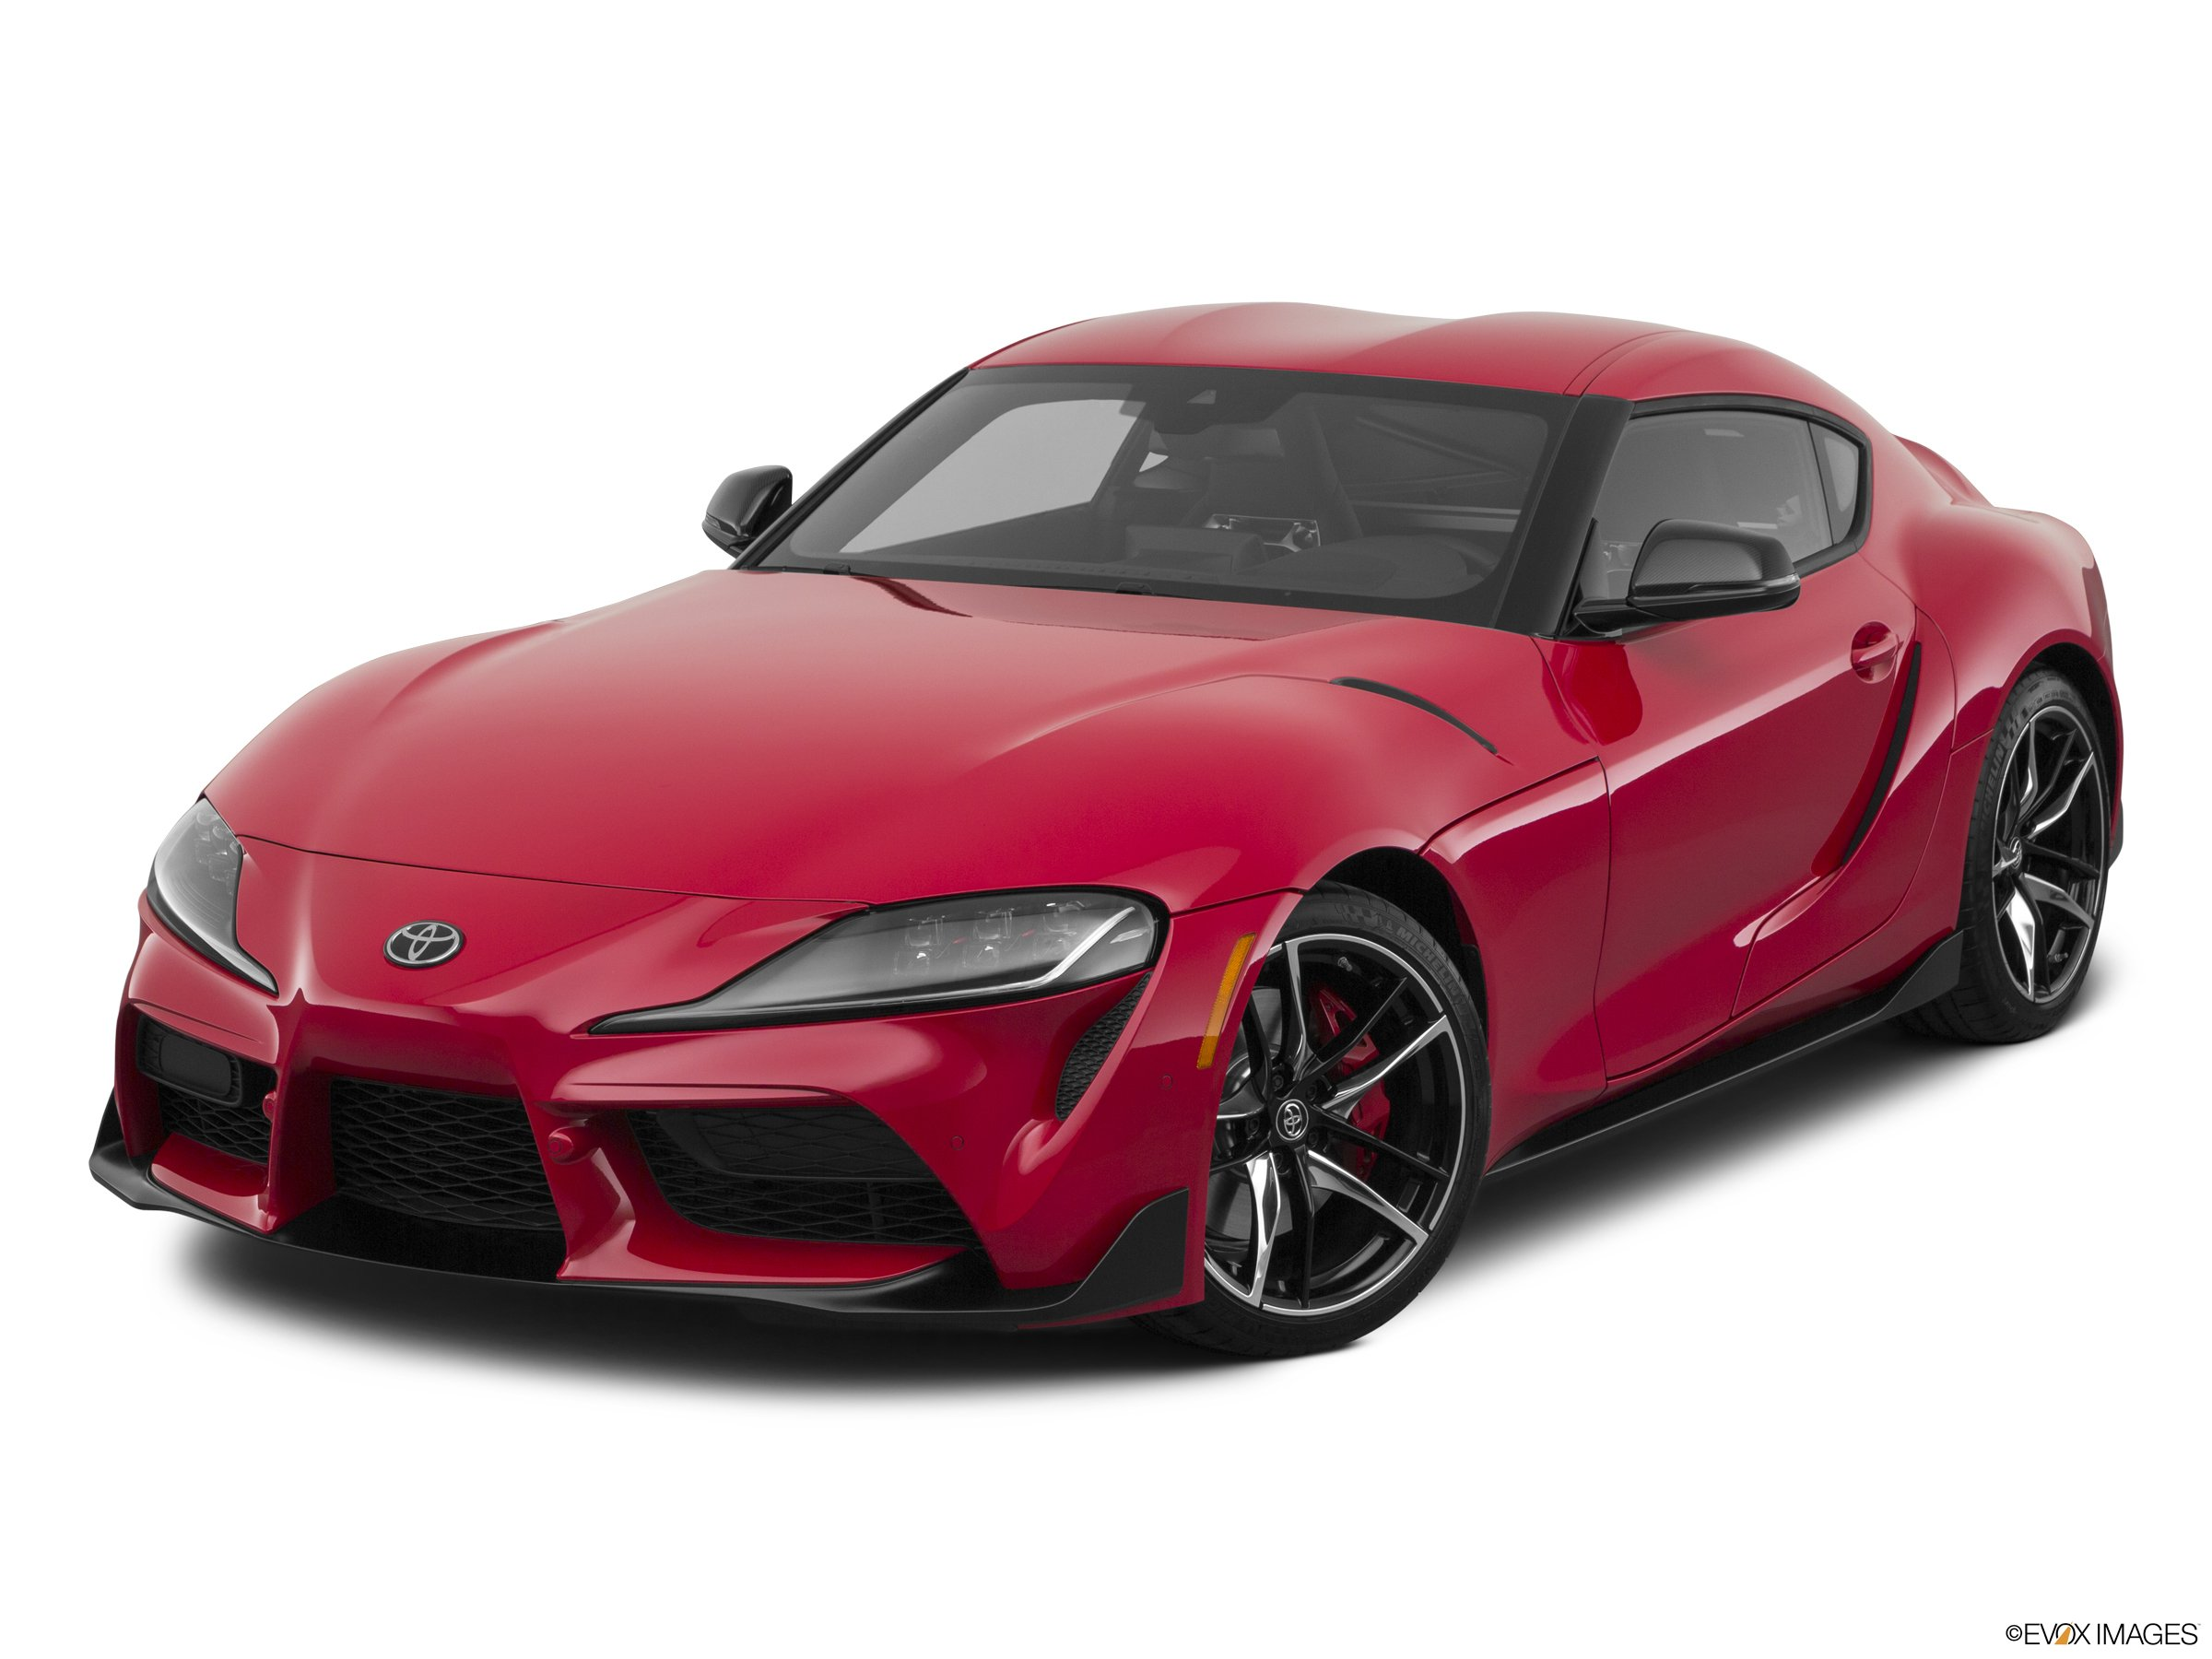 2020 Toyota GR Supra 3.0 Premium RWD coupe